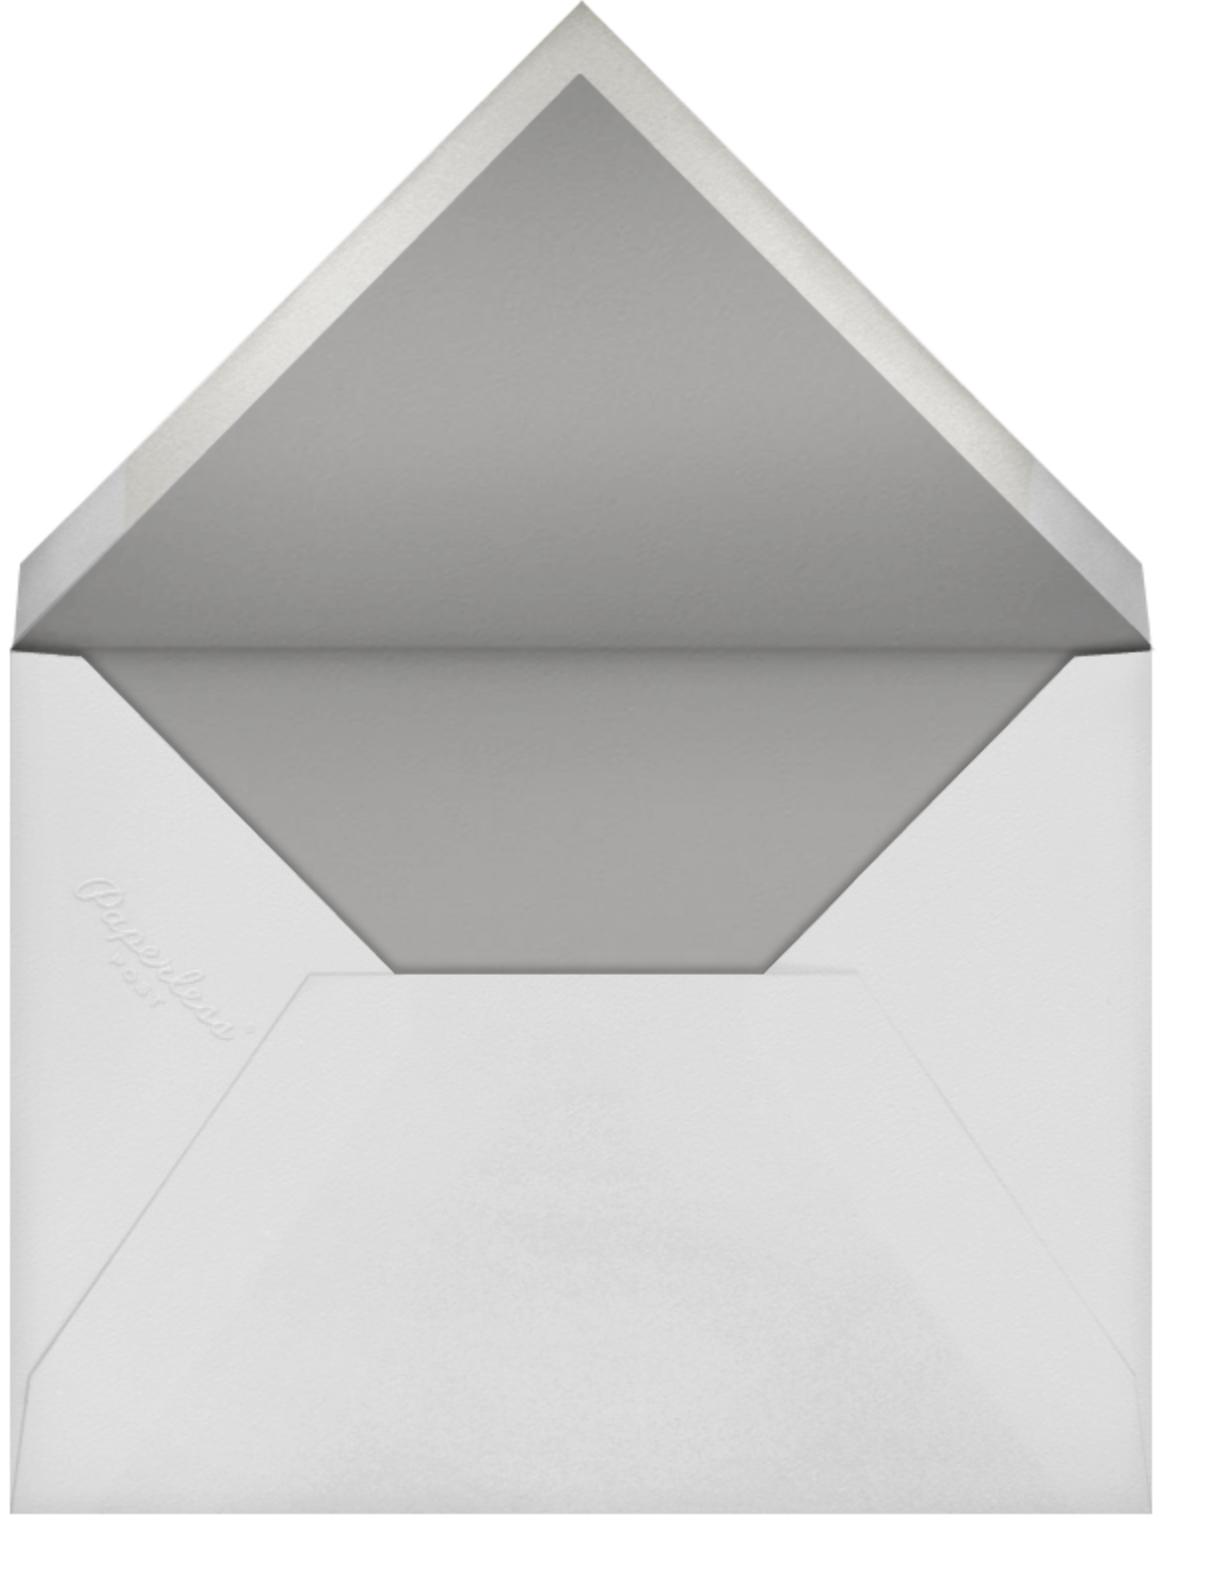 Richmond Park - White/Gold - Oscar de la Renta - Baby shower - envelope back